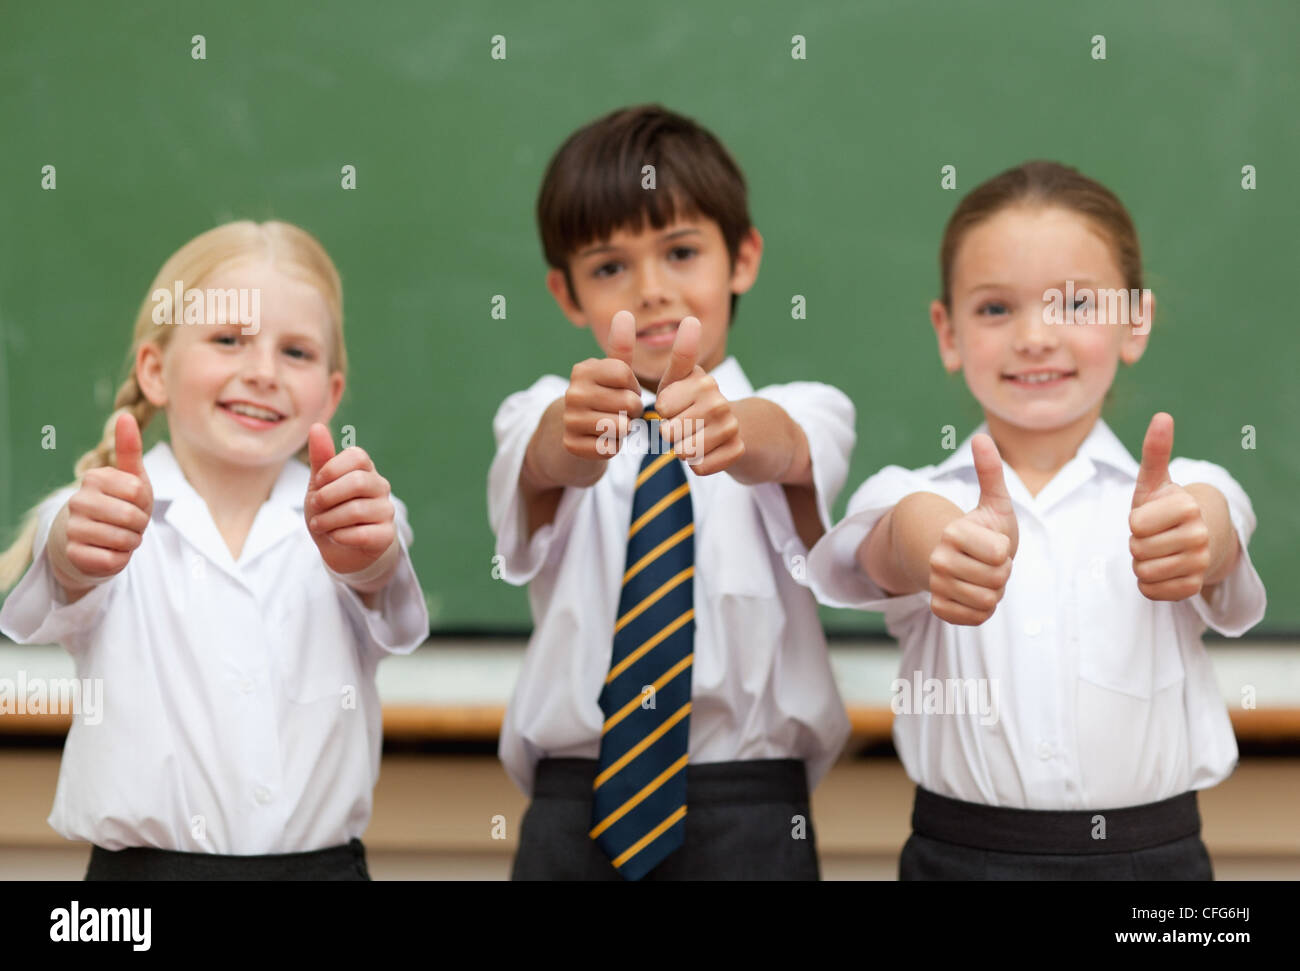 Smiling schoolchildren giving thumbs up - Stock Image